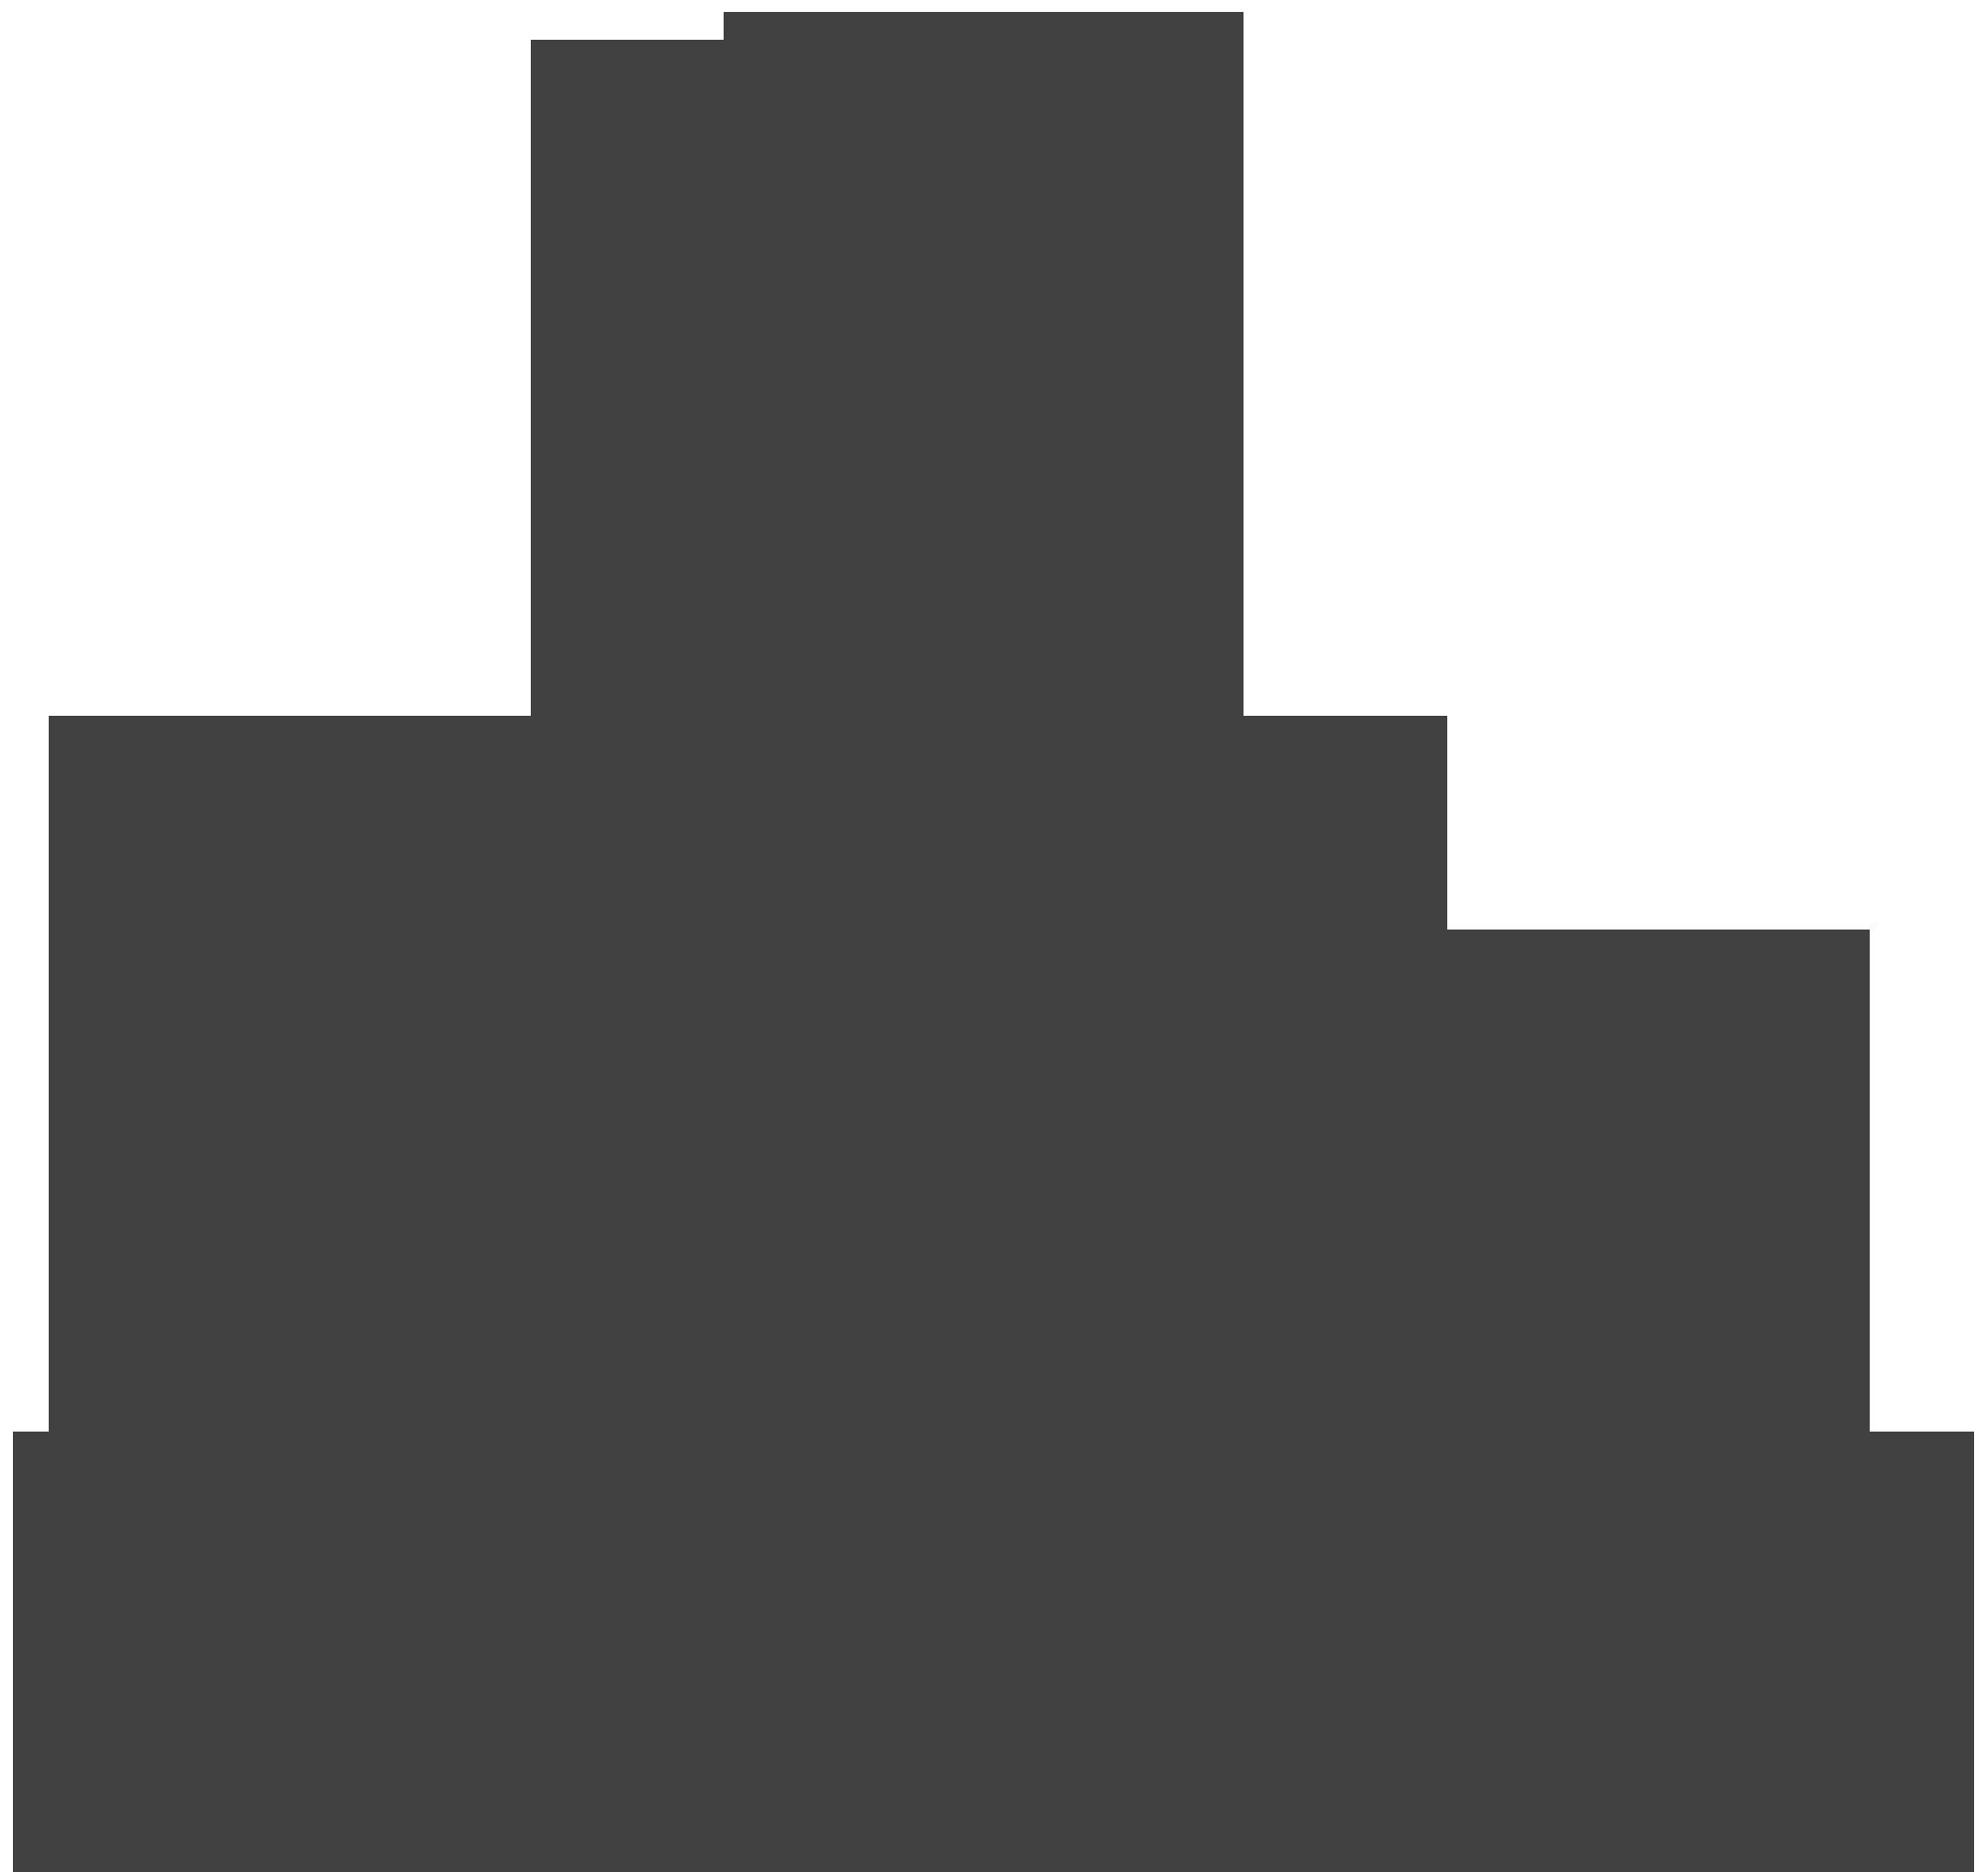 Silhouette of an APEX Portal client.